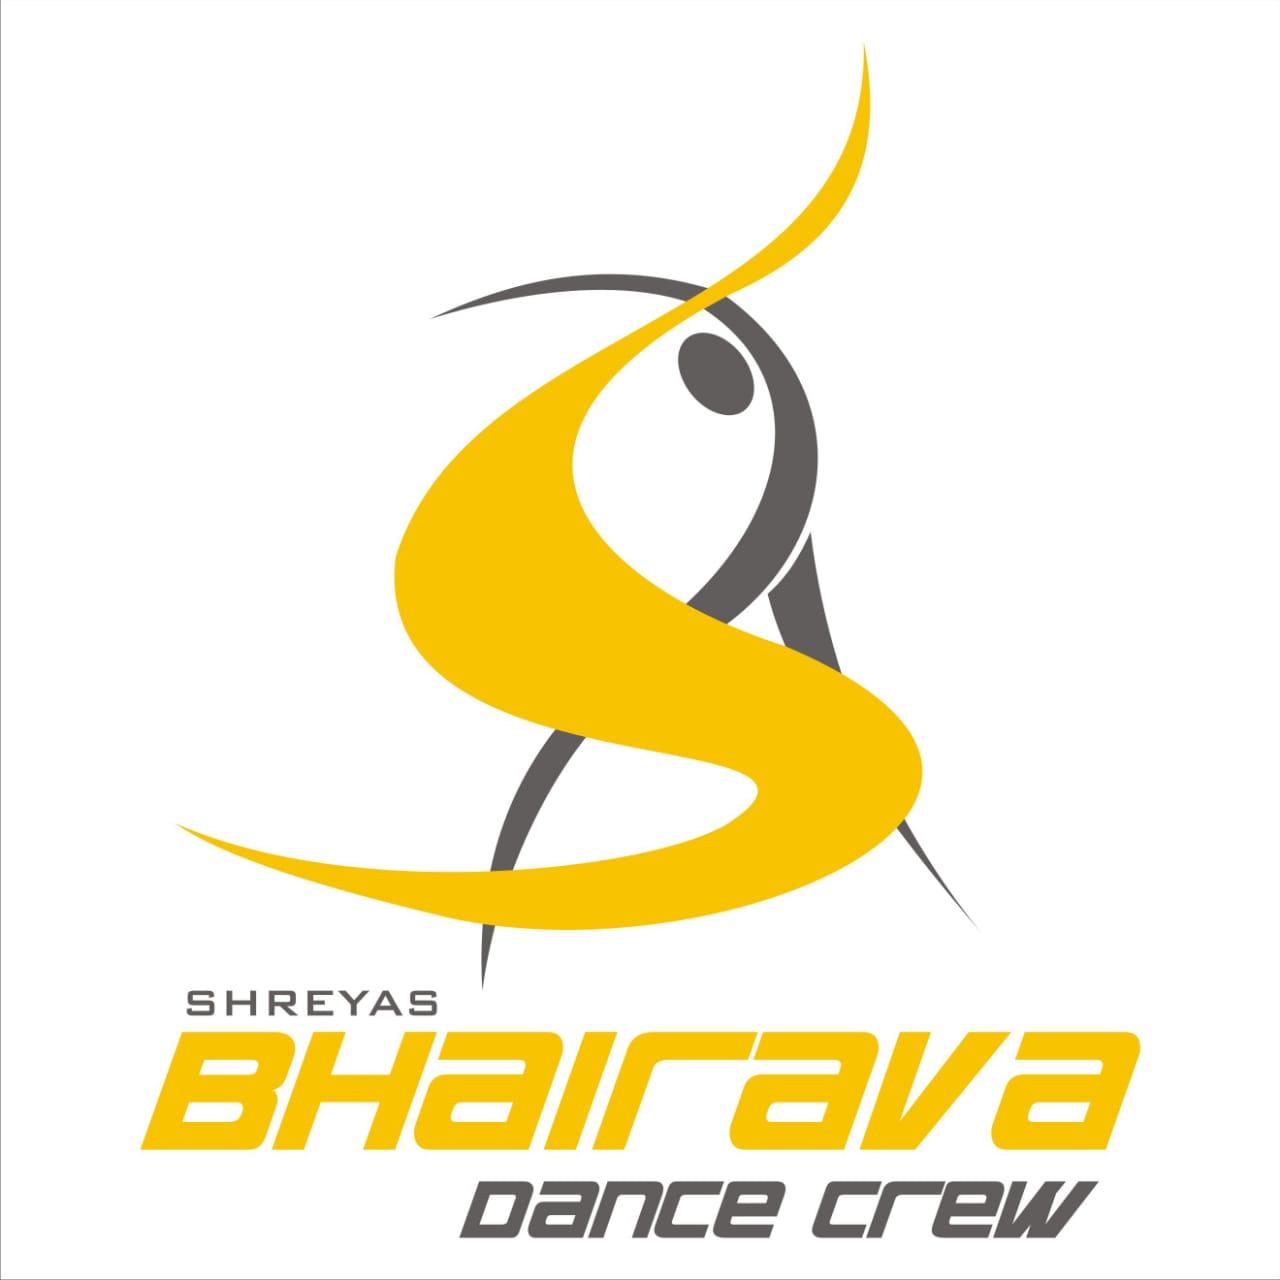 Shreyas Bhairava Dance Crew RT Nagar